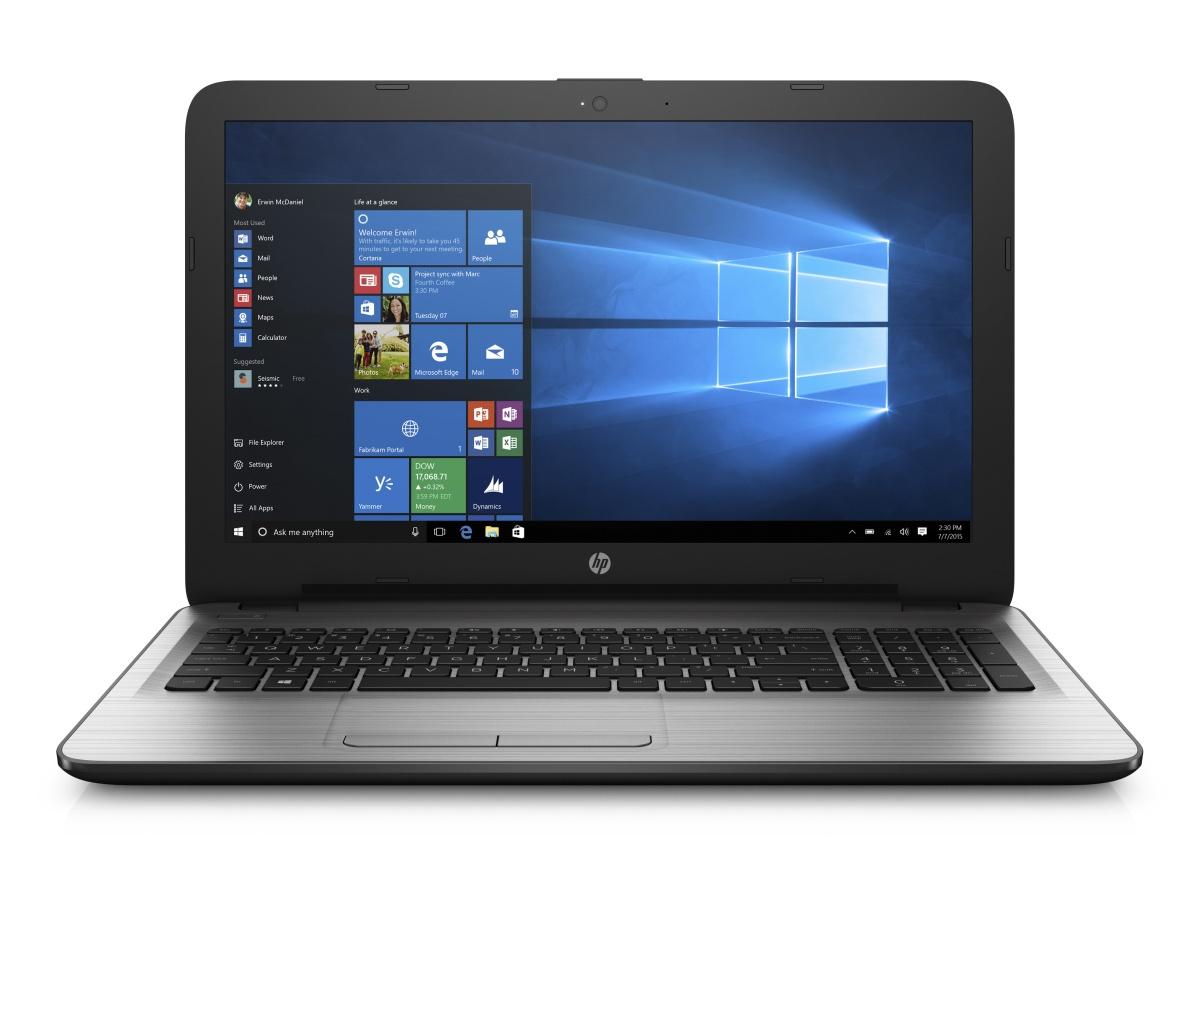 HP 250 G5 15.6 HD/N3060/4GB/500G/DVD/HDMI/VGA/RJ45/WIFI/BT/MCR/1RServis/W10